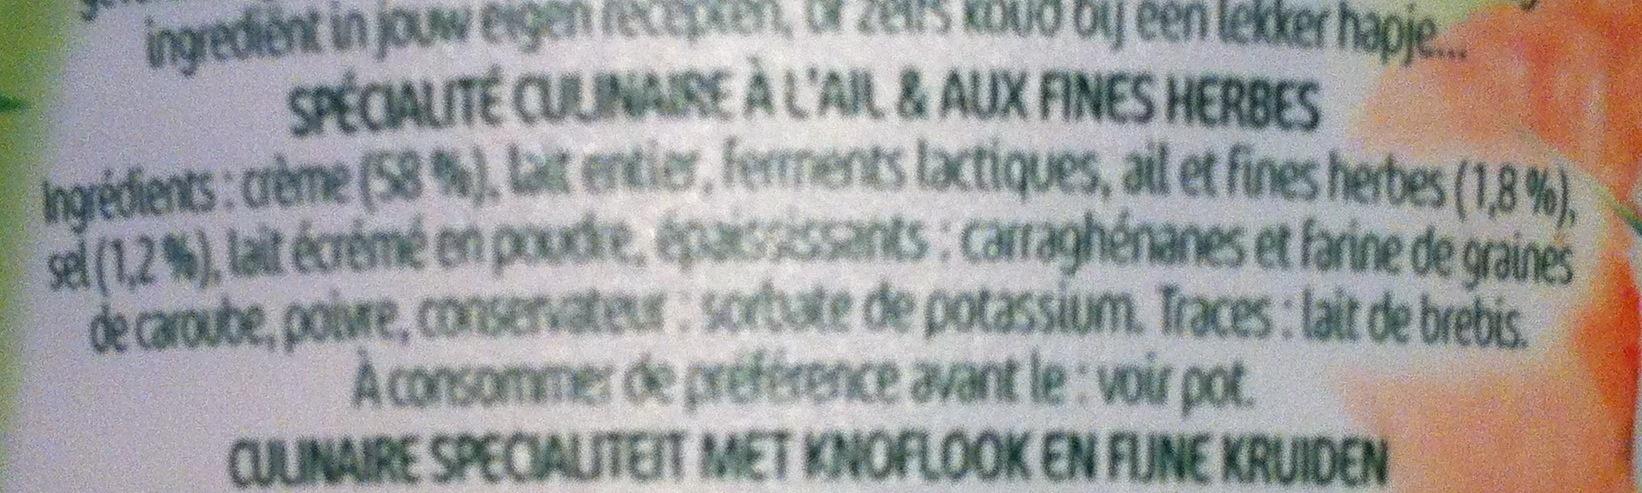 Cuisine Ail & Fines Herbes (20 % MG) - Ingredients - fr